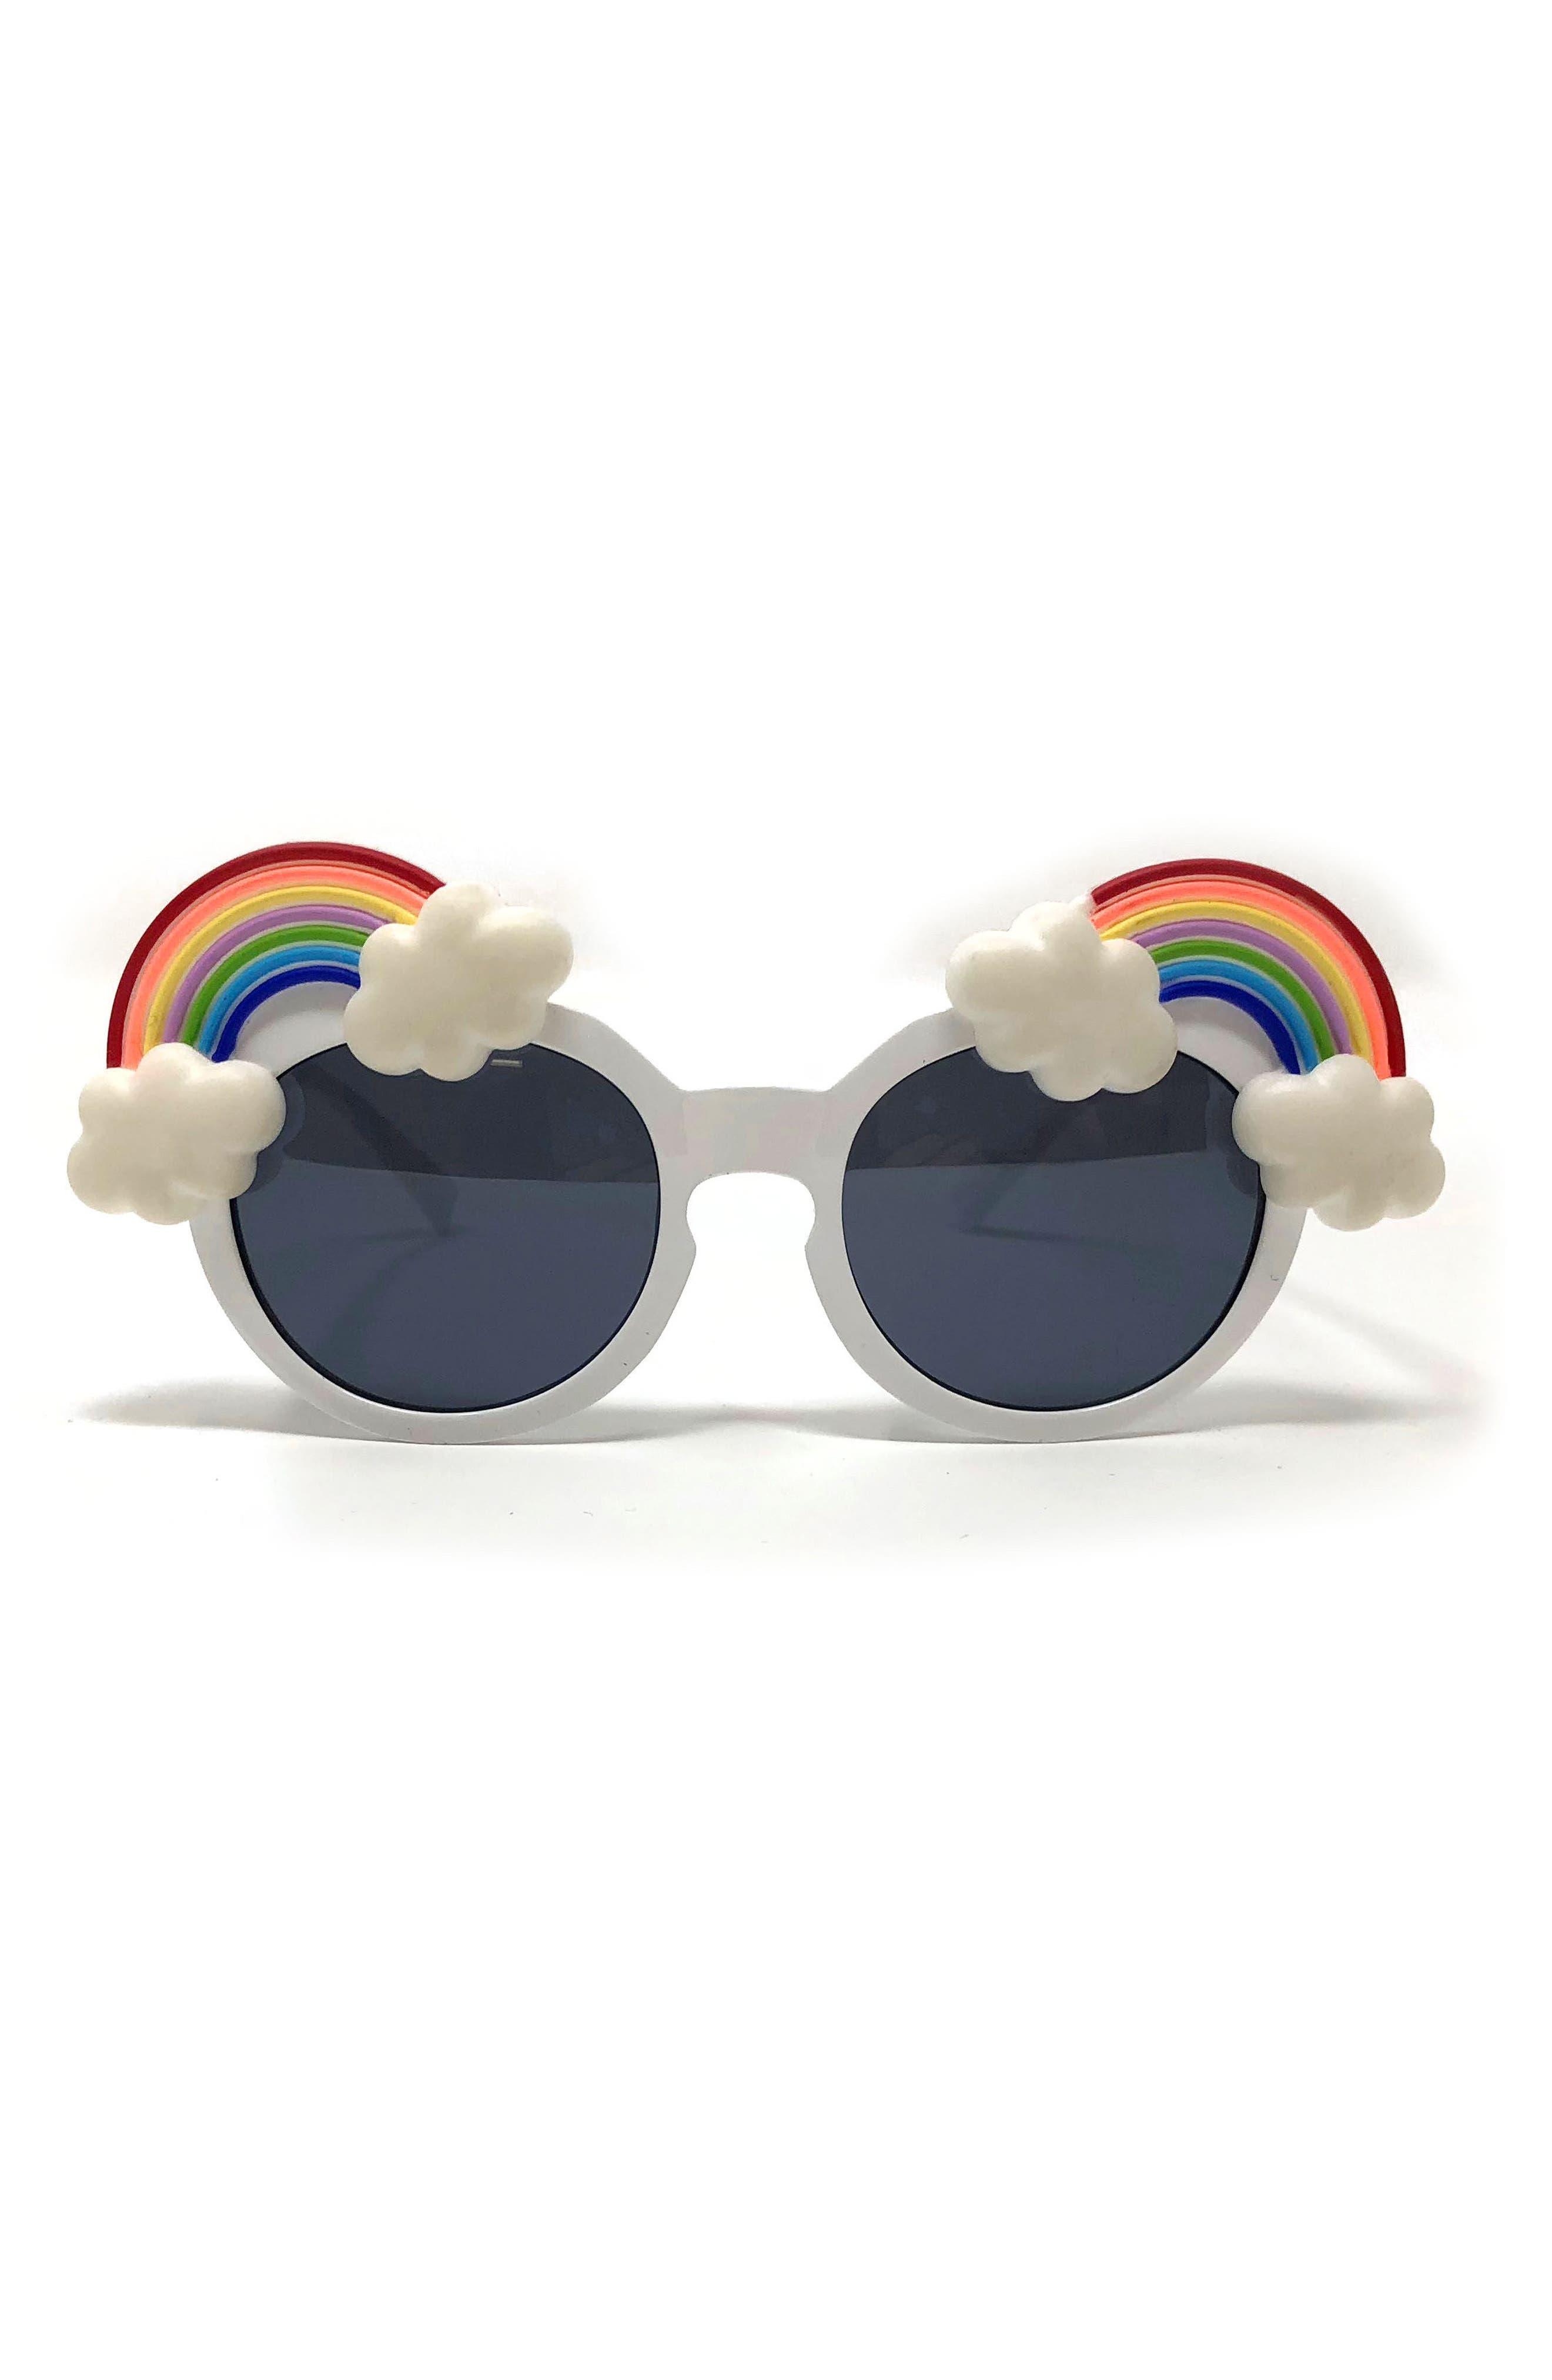 Small Round Rainbow Sunglasses,                             Main thumbnail 1, color,                             WHITE/RAINBOW